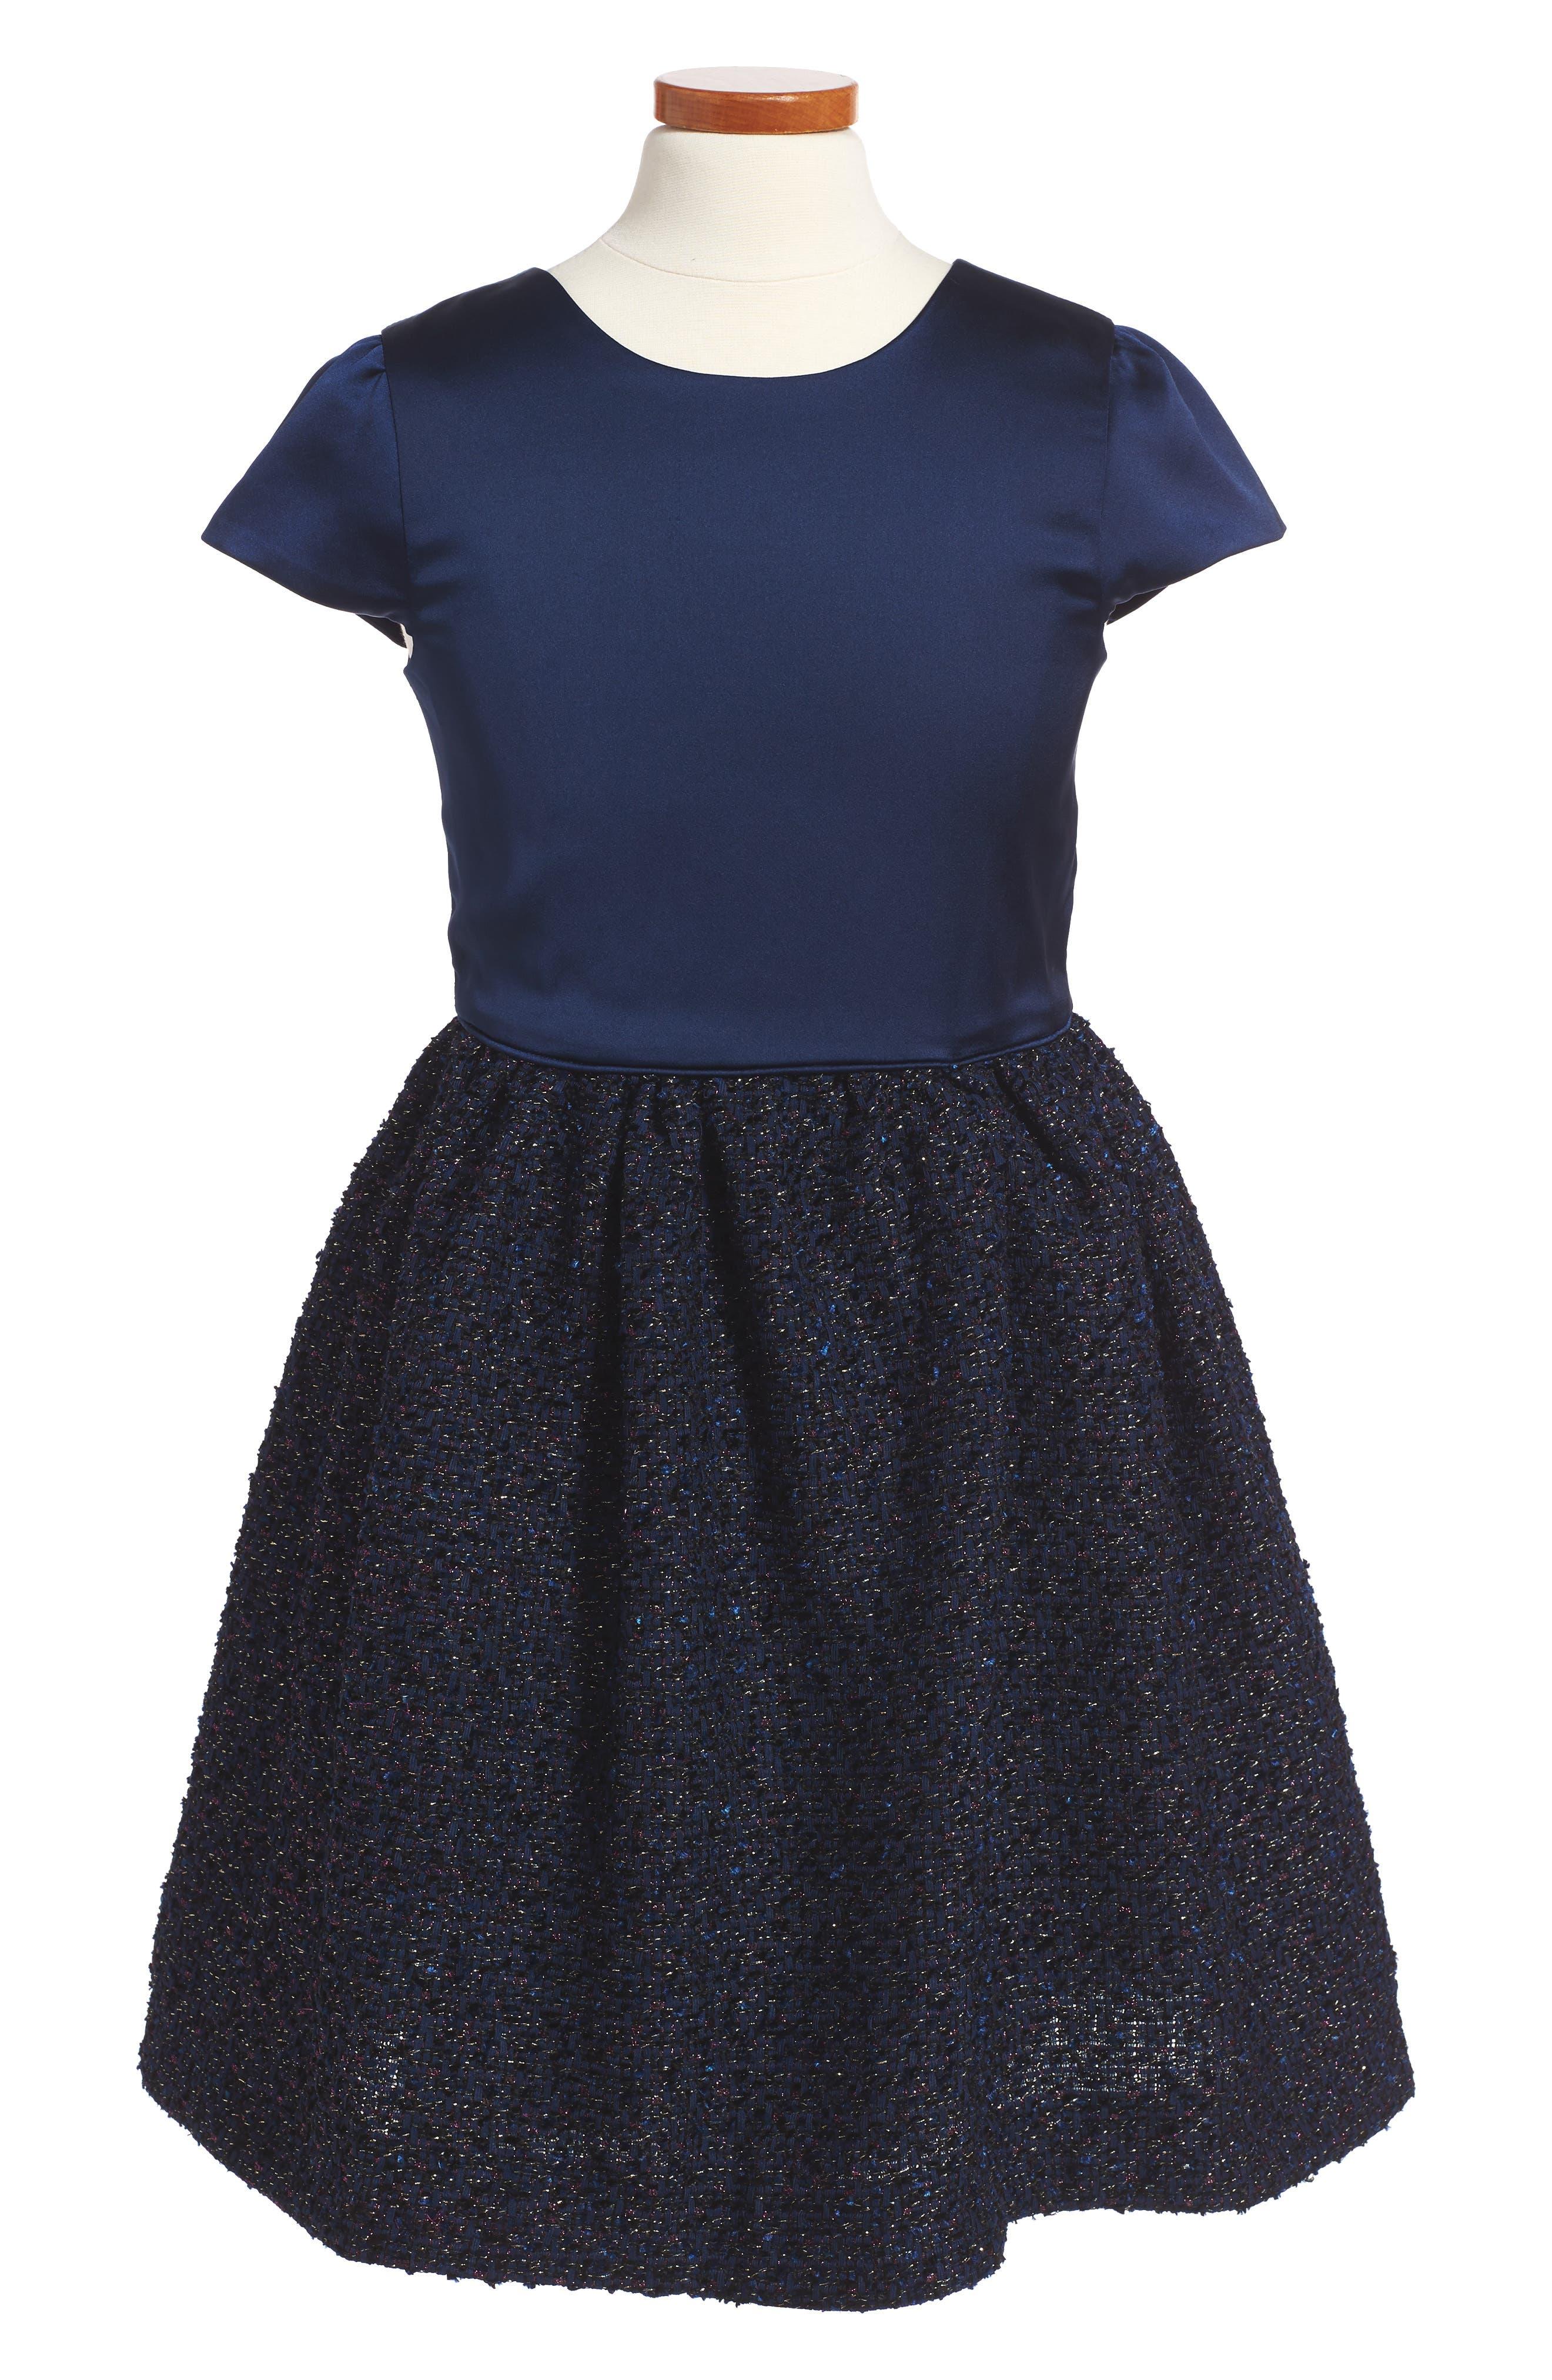 Main Image - Oh My Satin Dress (Little Girls & Big Girls)